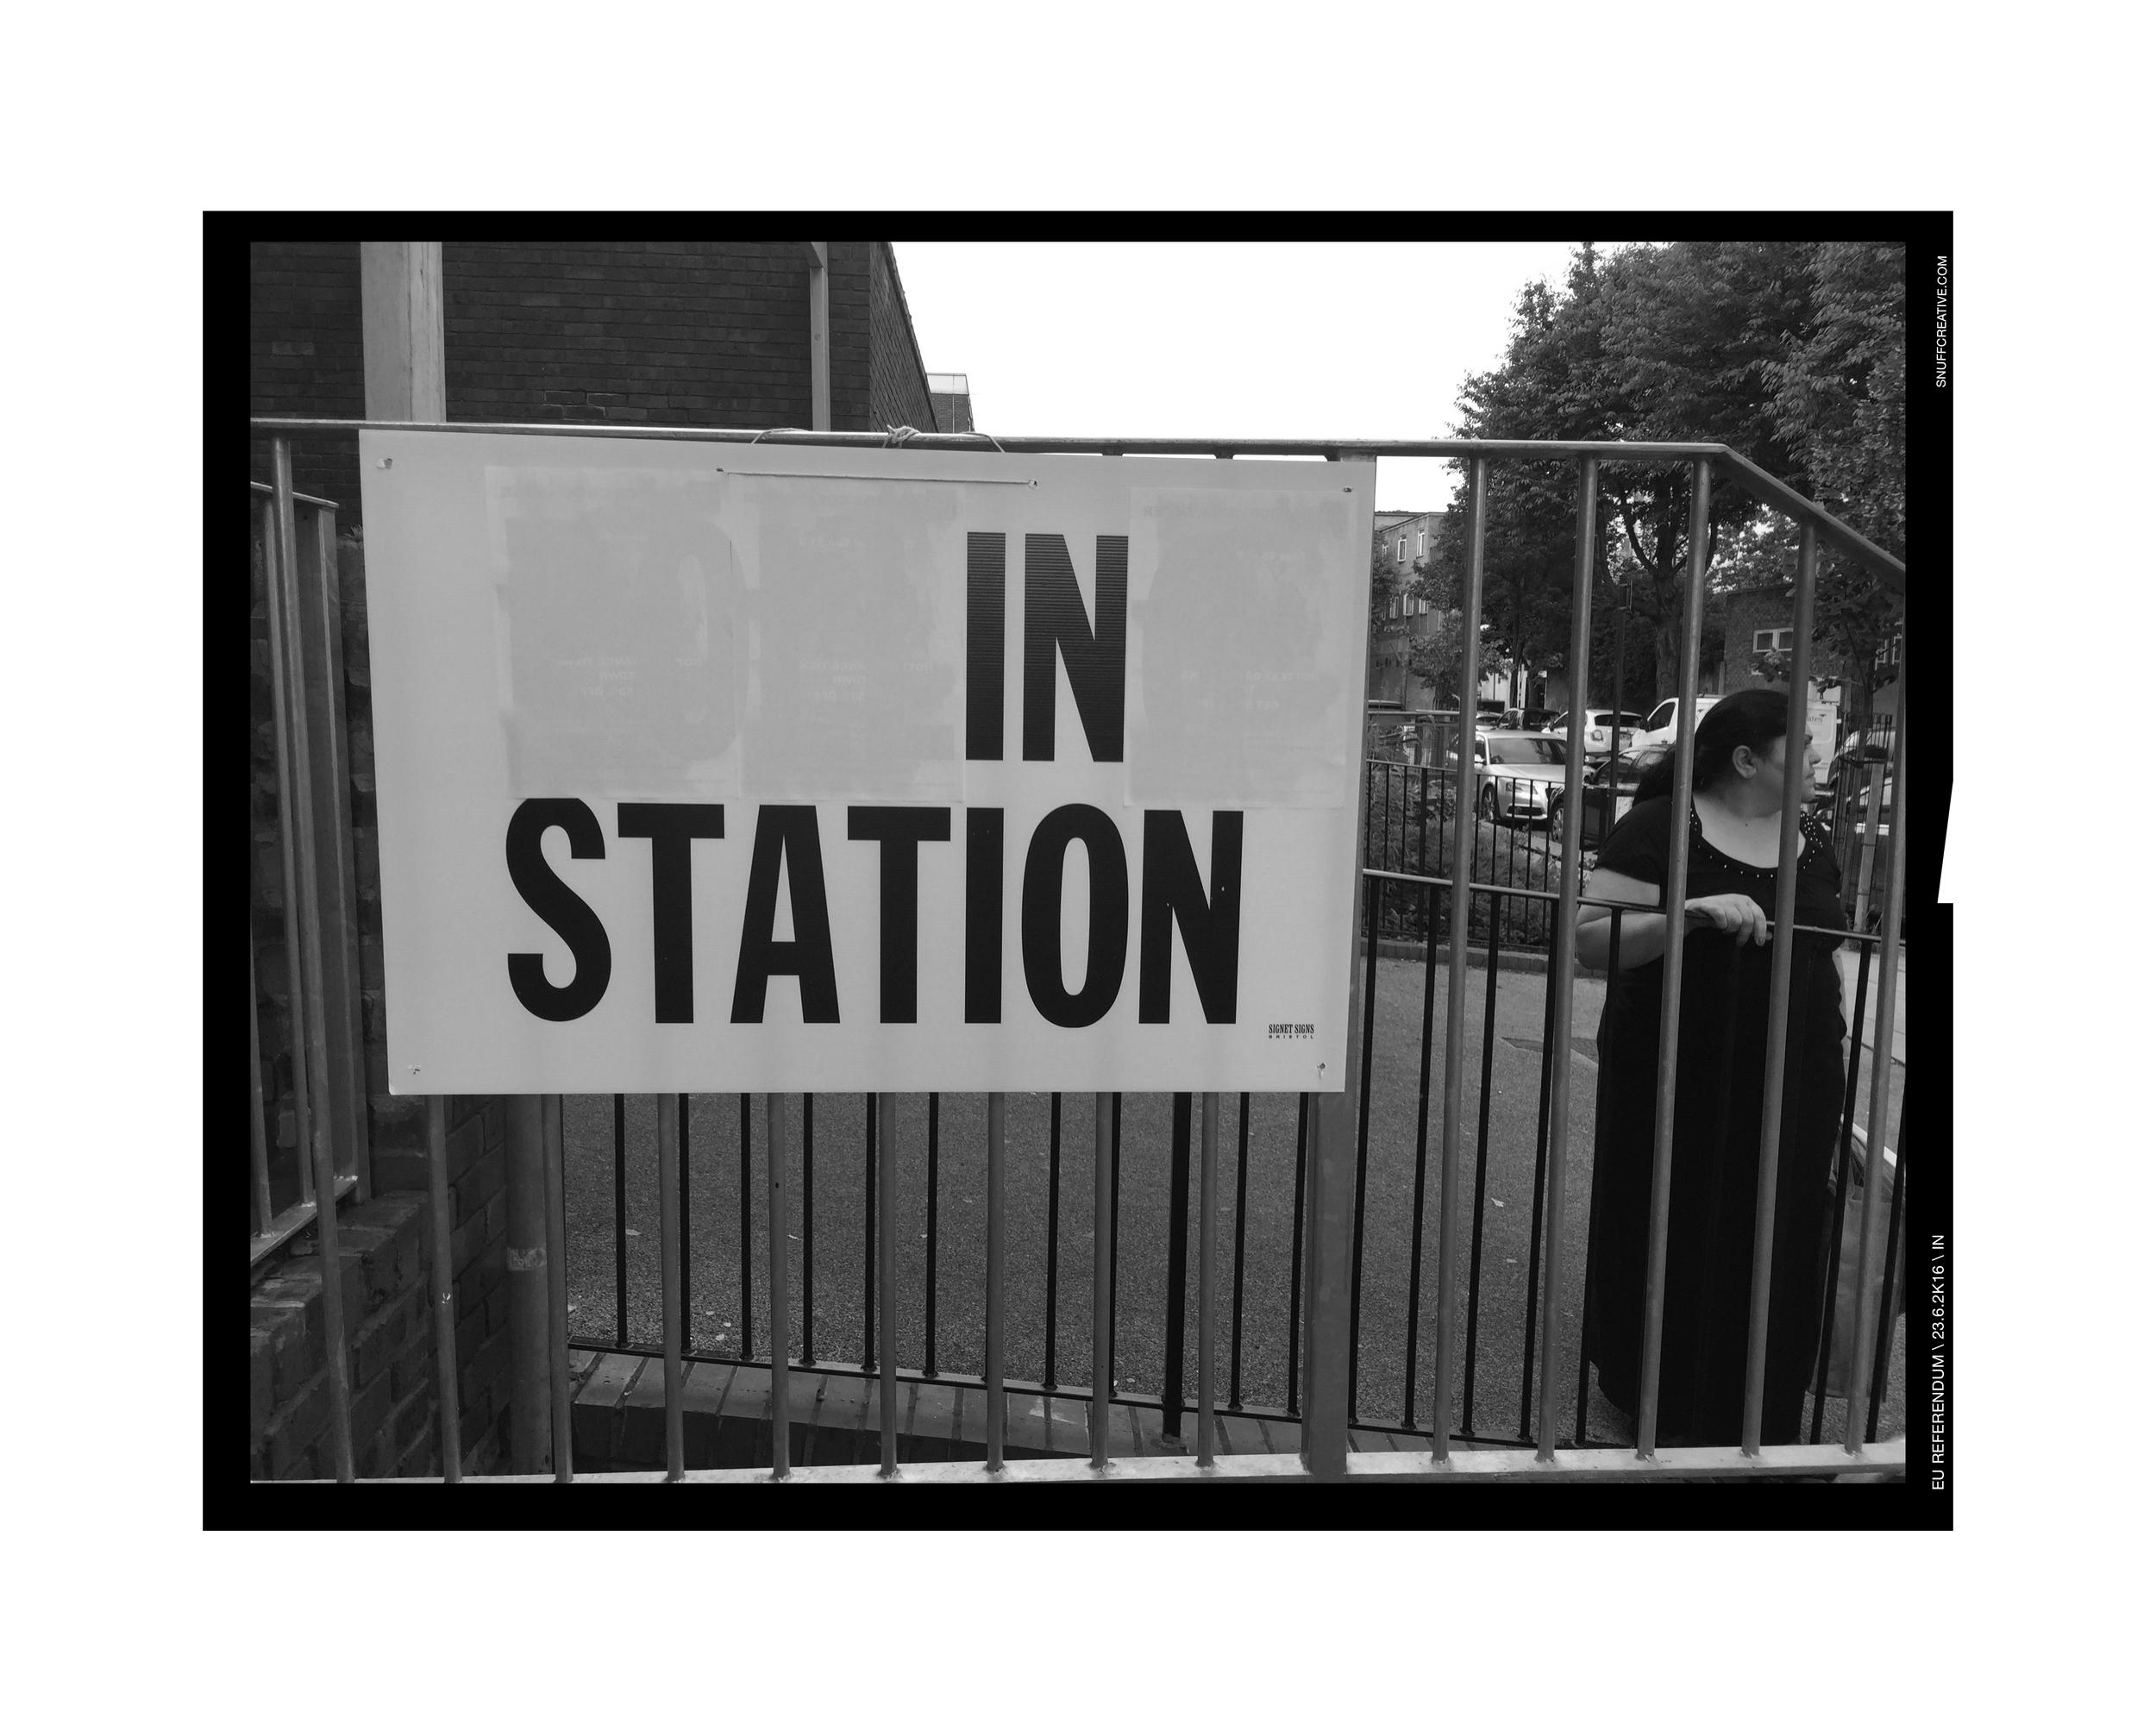 IN STATION-EU REFERENDUMgrey2-SNUFFCREATIVE2016.jpg